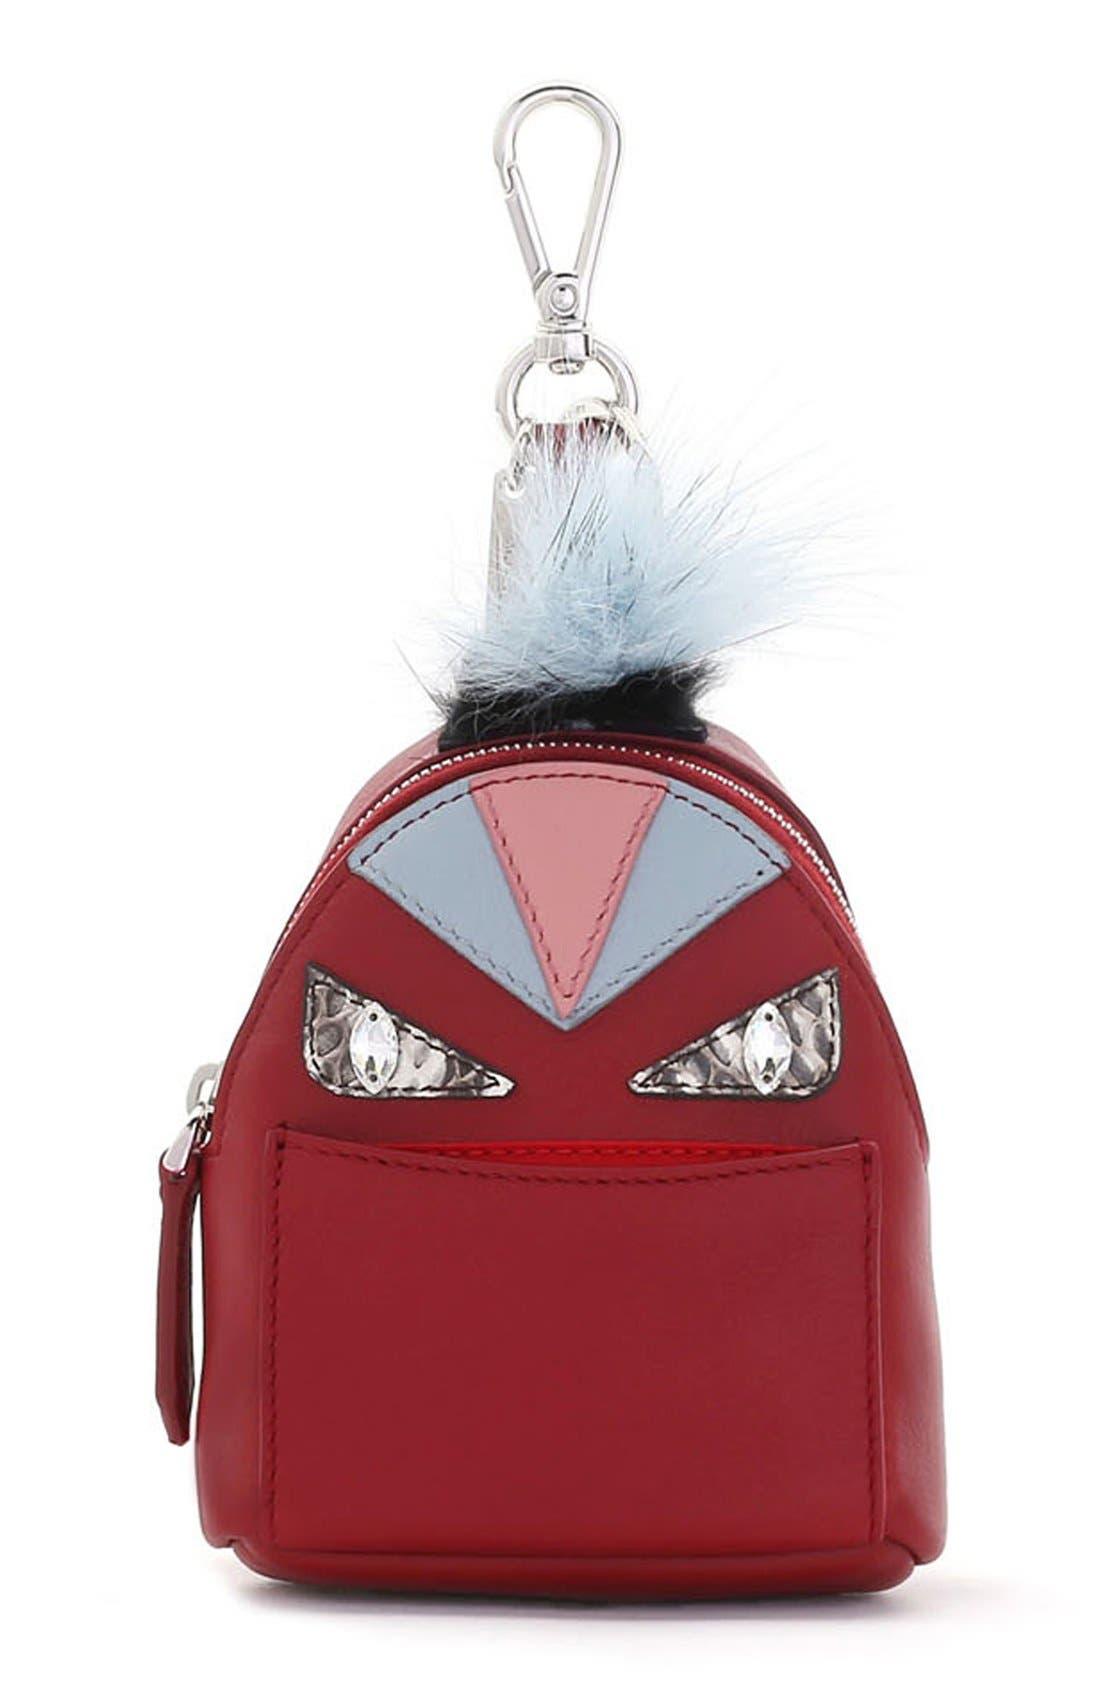 Main Image - Fendi 'Monster' Genuine Fox Fur Trim Backpack Bag Charm